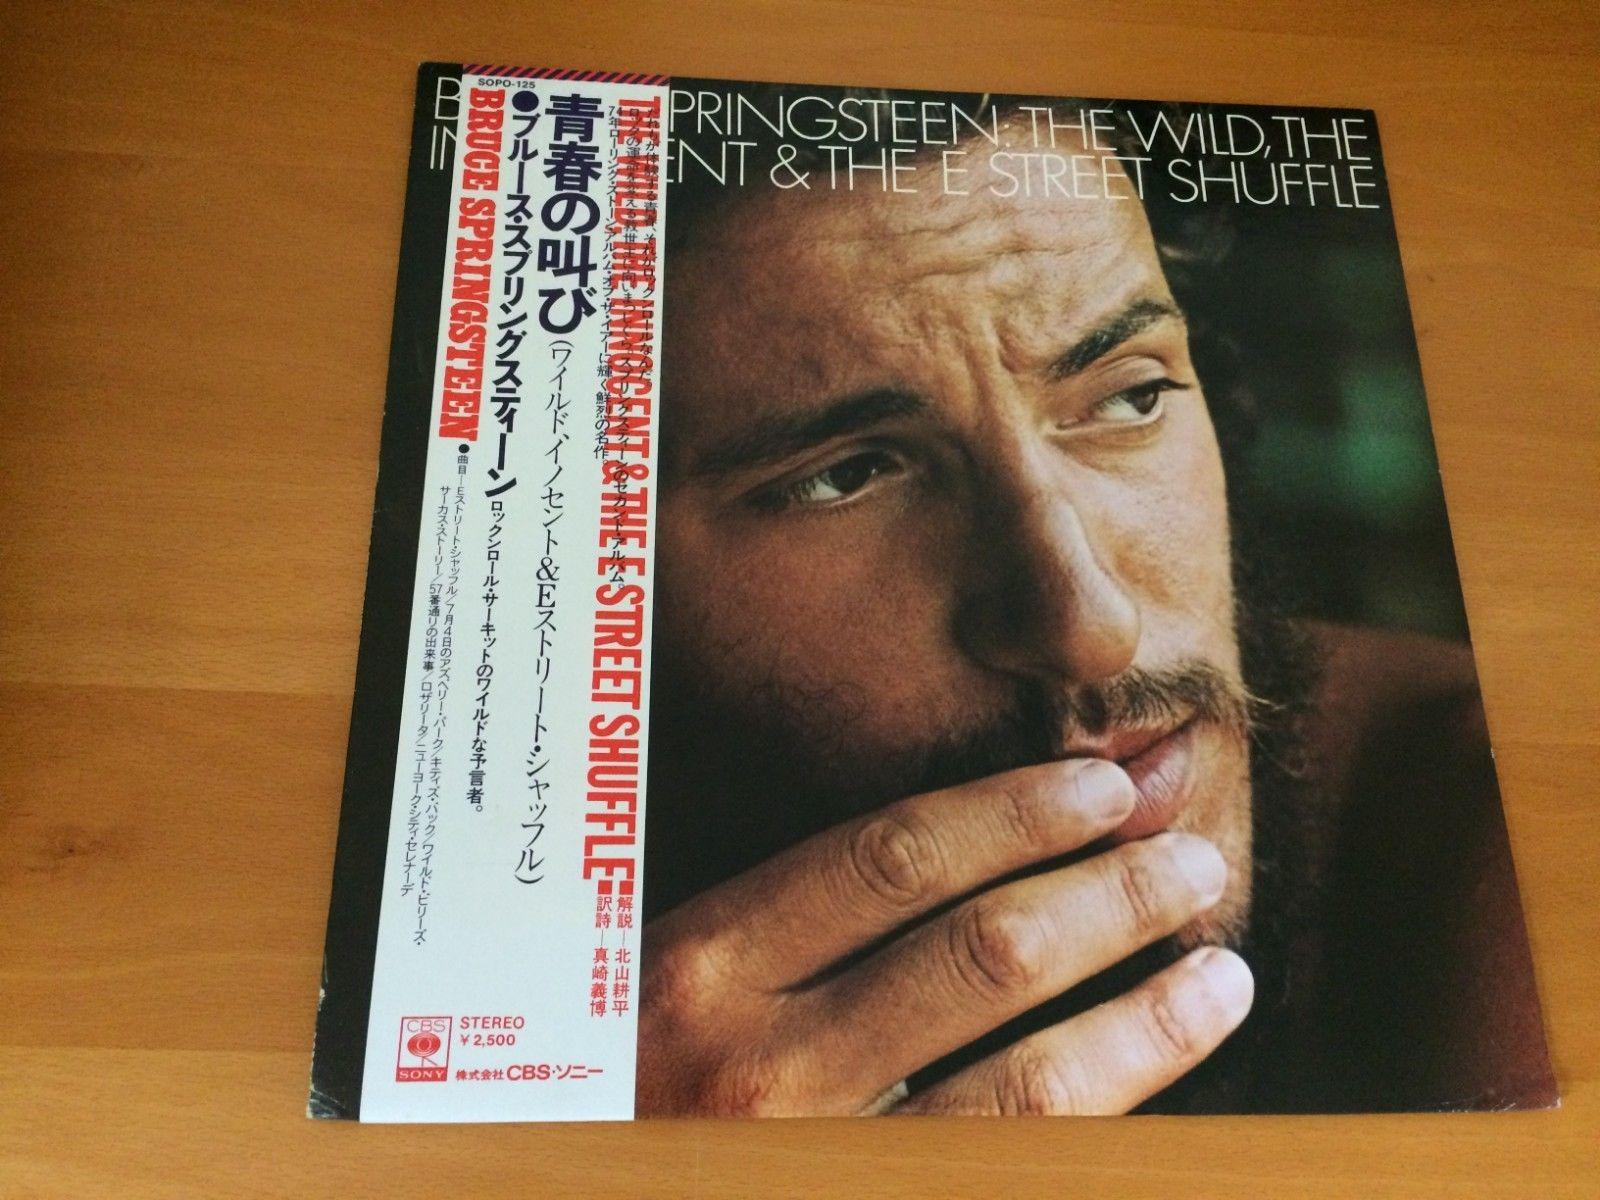 LP BRUCE SPRINGSTEEN THE WILD THE INNOCENT & THE E STREET SHUFFLE JAPAN OBI